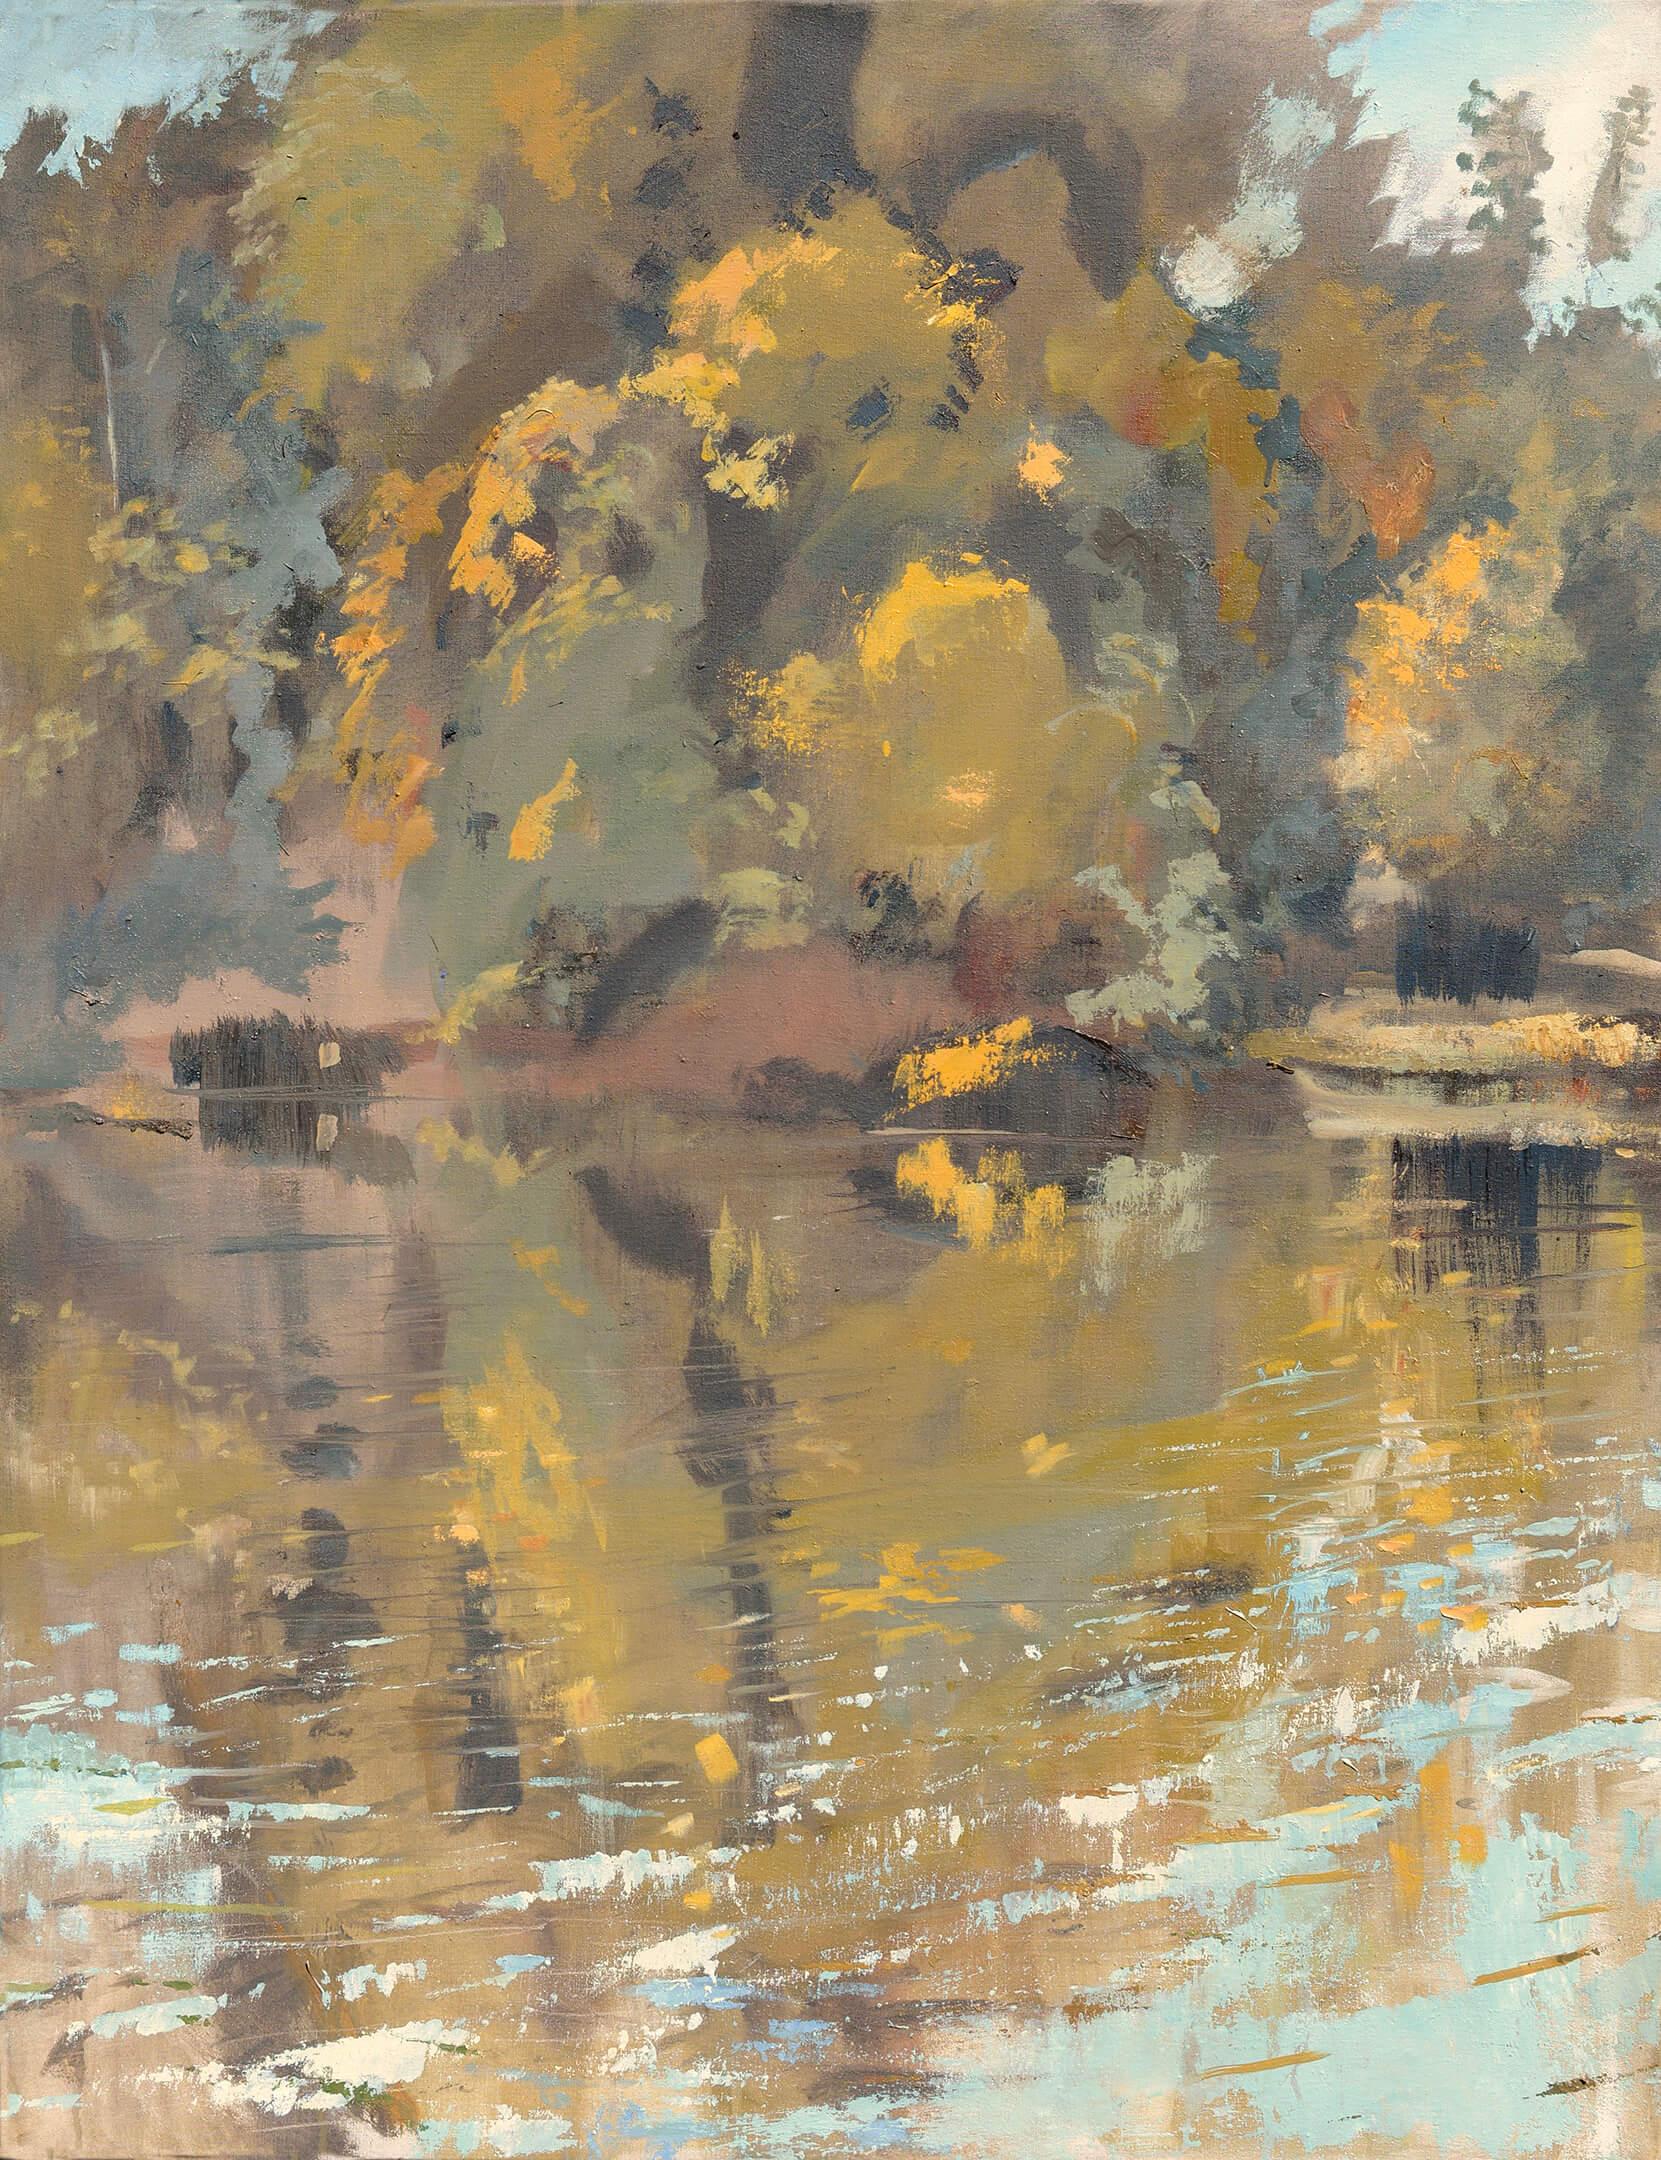 RHSK004 Matsubarako Lake Autumn ( Oil on Linen ) 110.5 x 85.5 cm